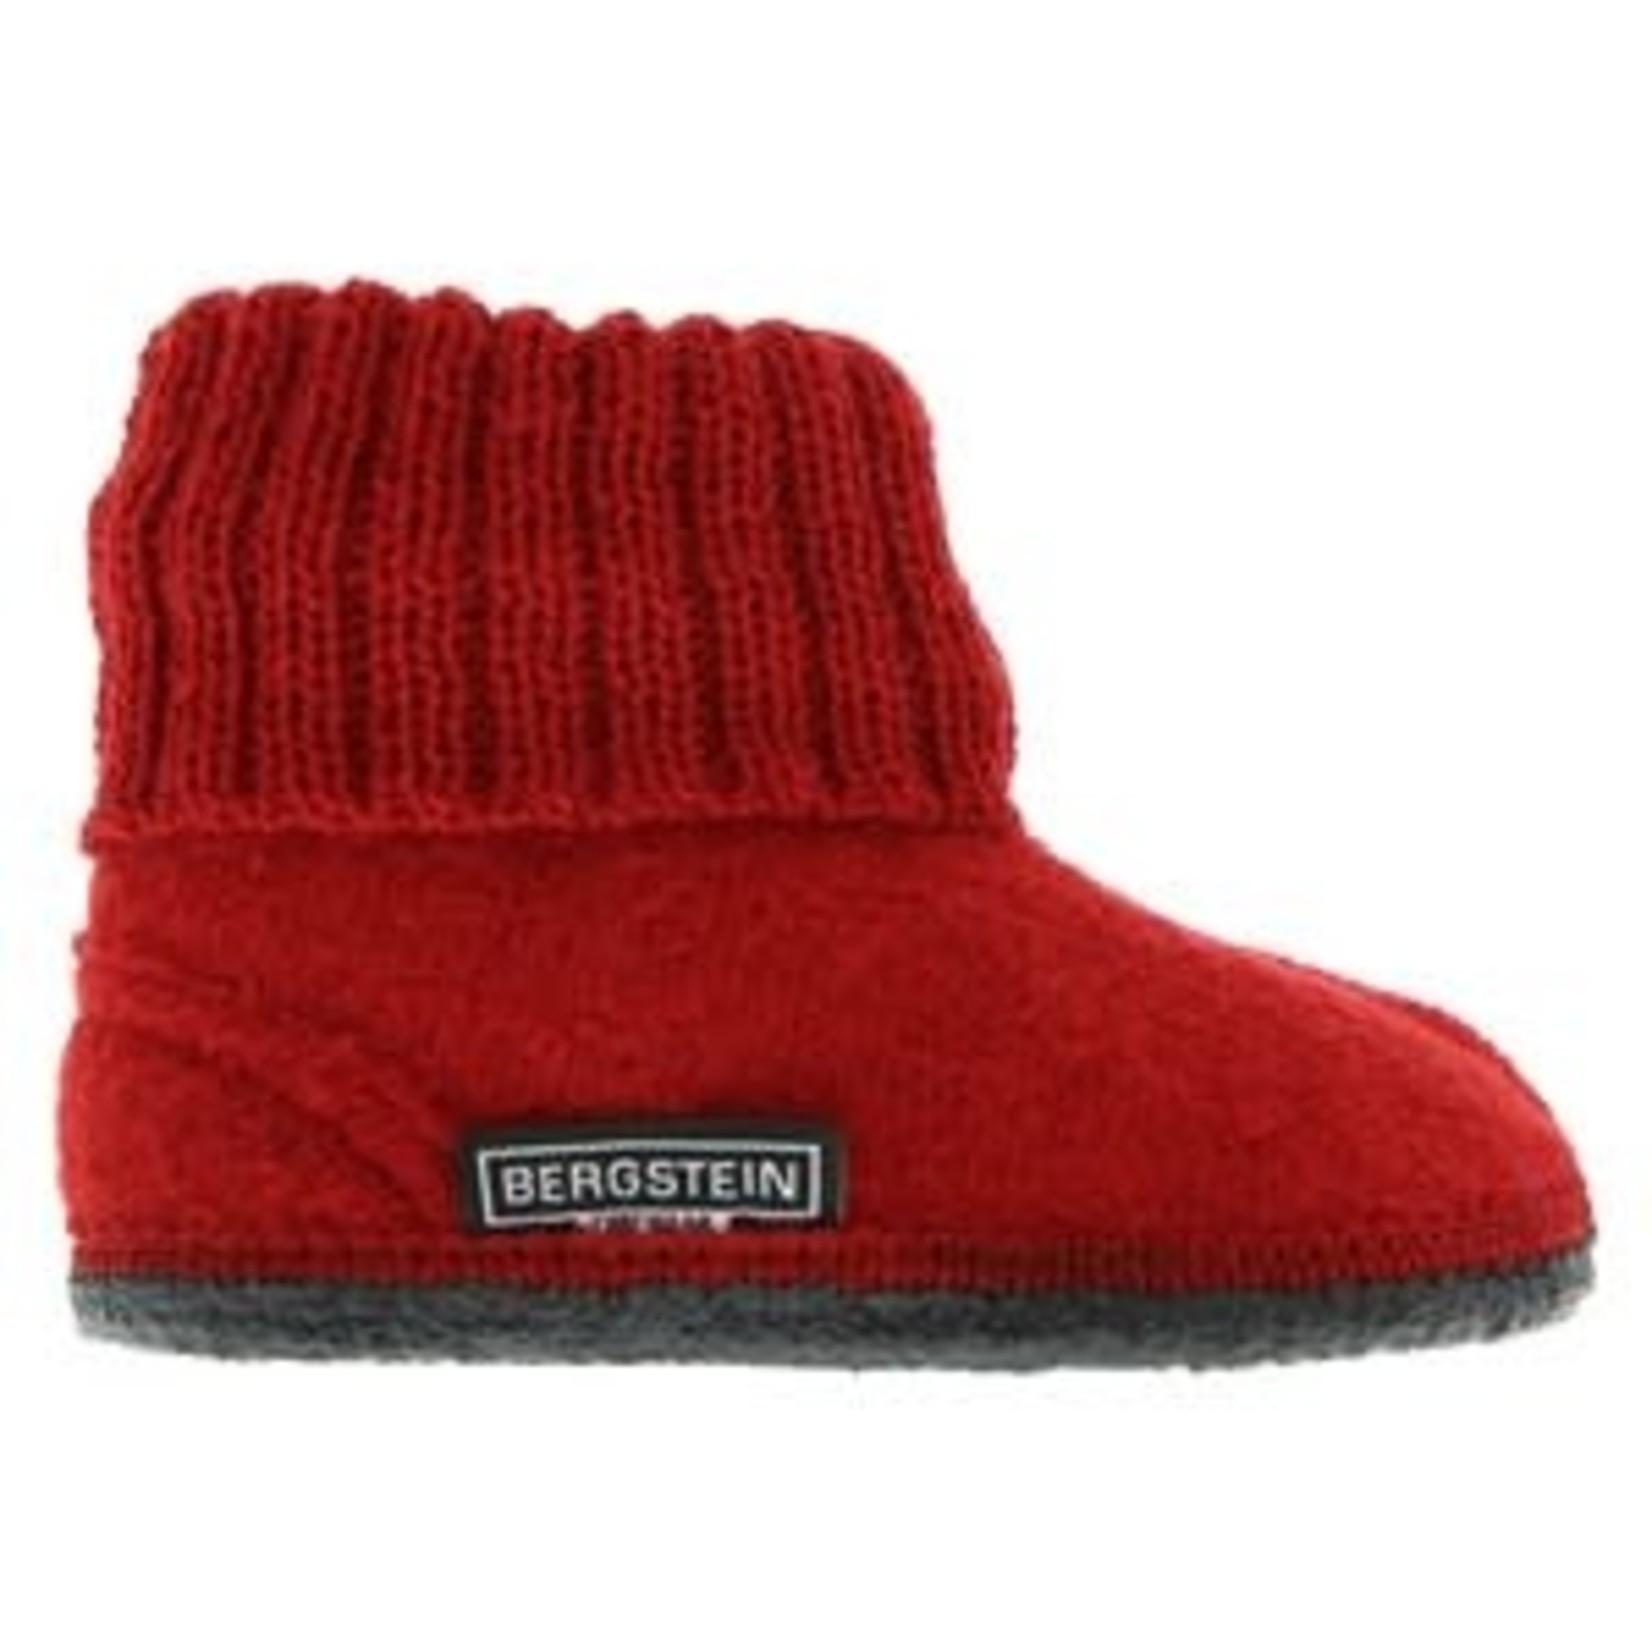 BERGSTEIN BERGSTEIN cozy red